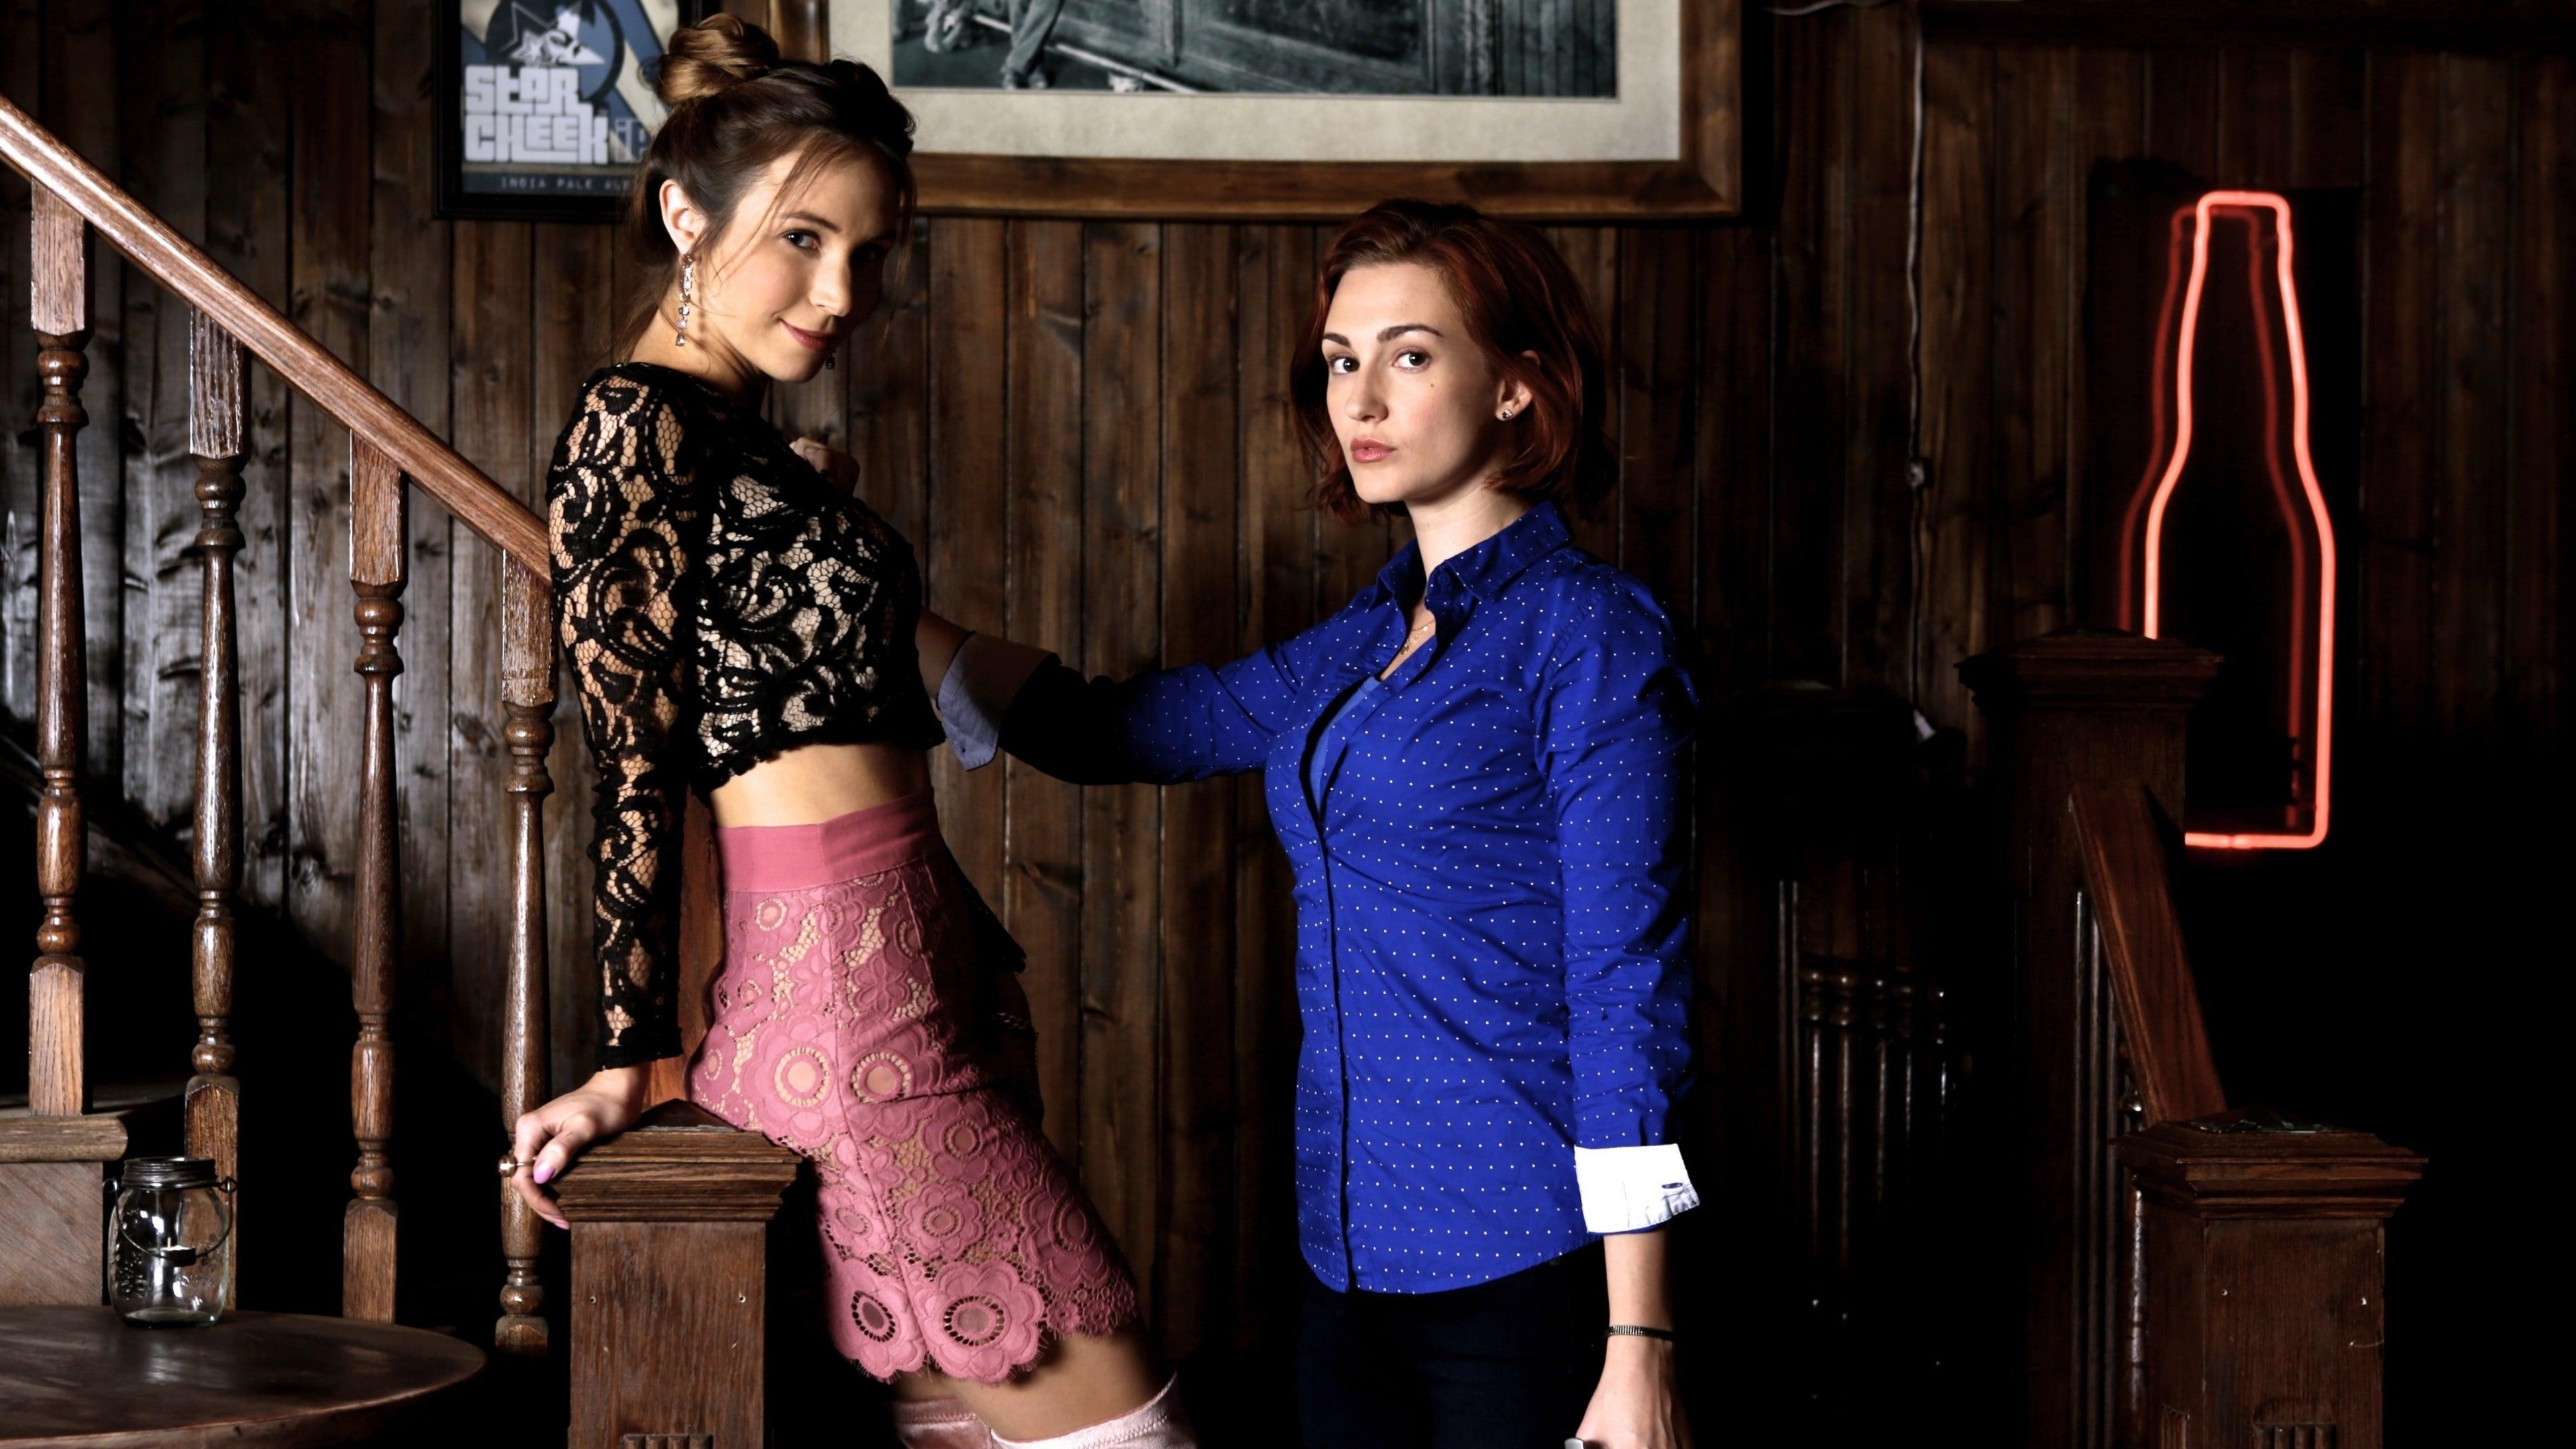 Wynonna Earp 2016 Tv Show